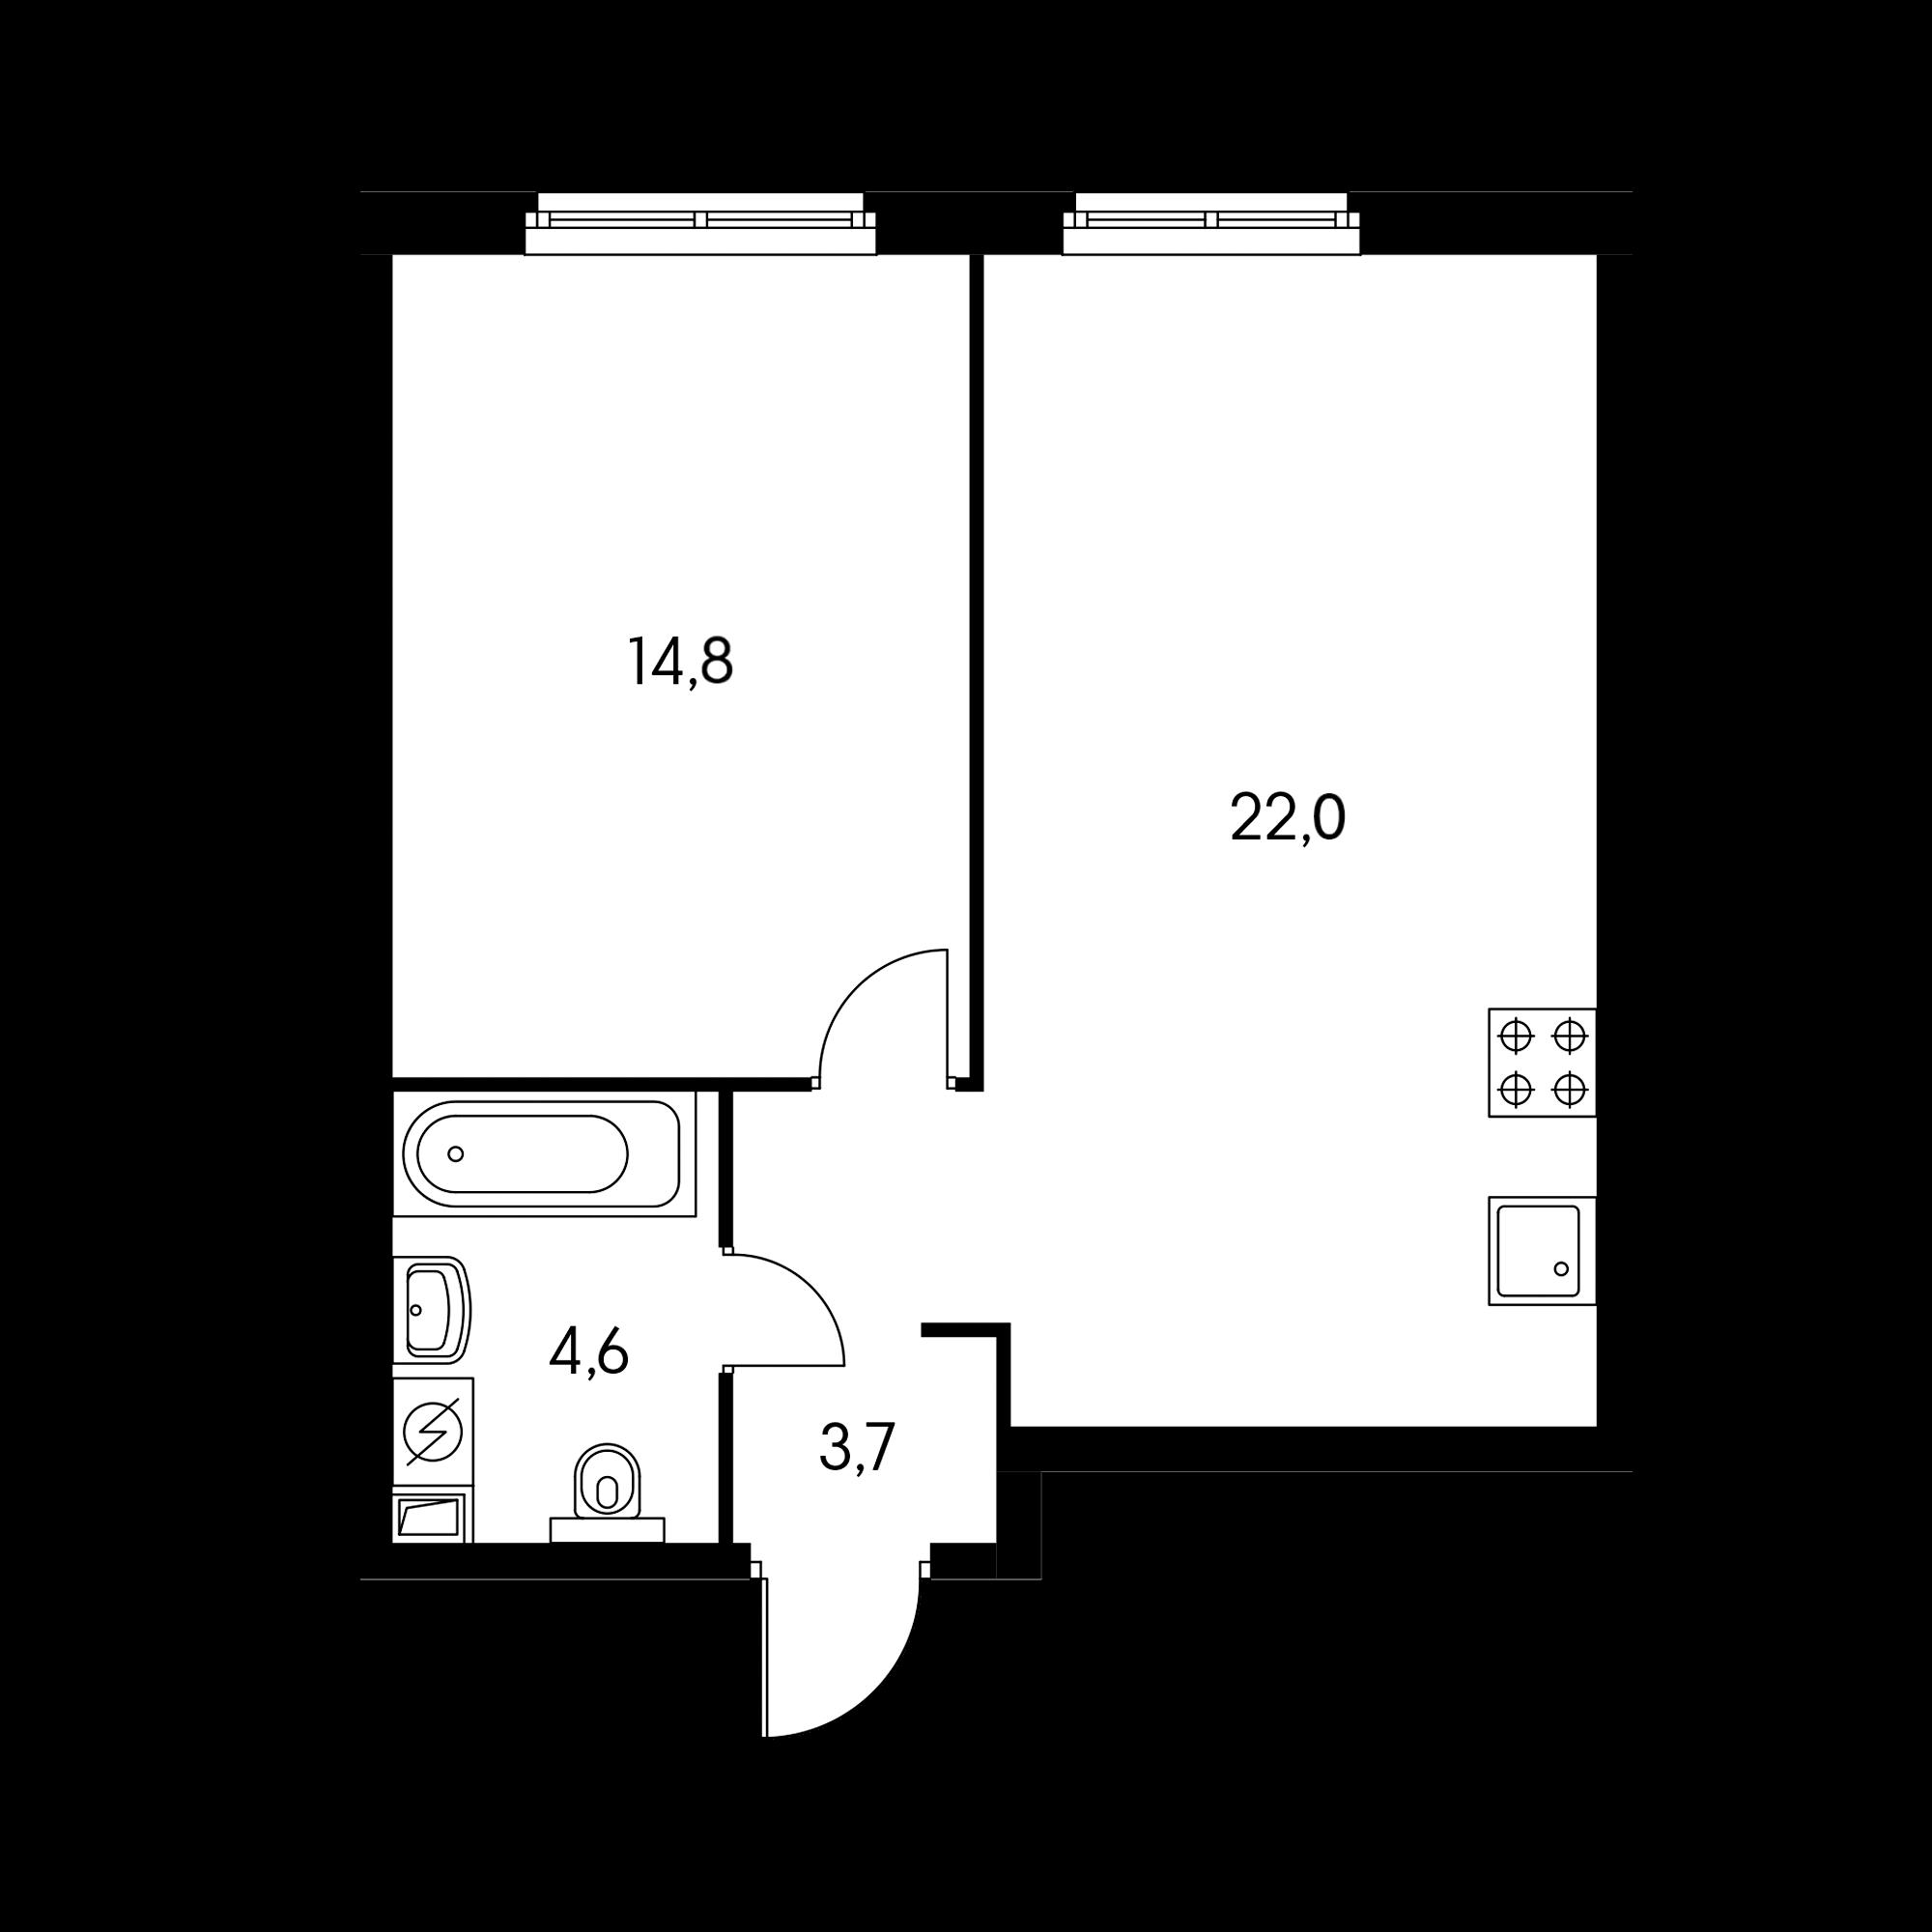 1EL3-2